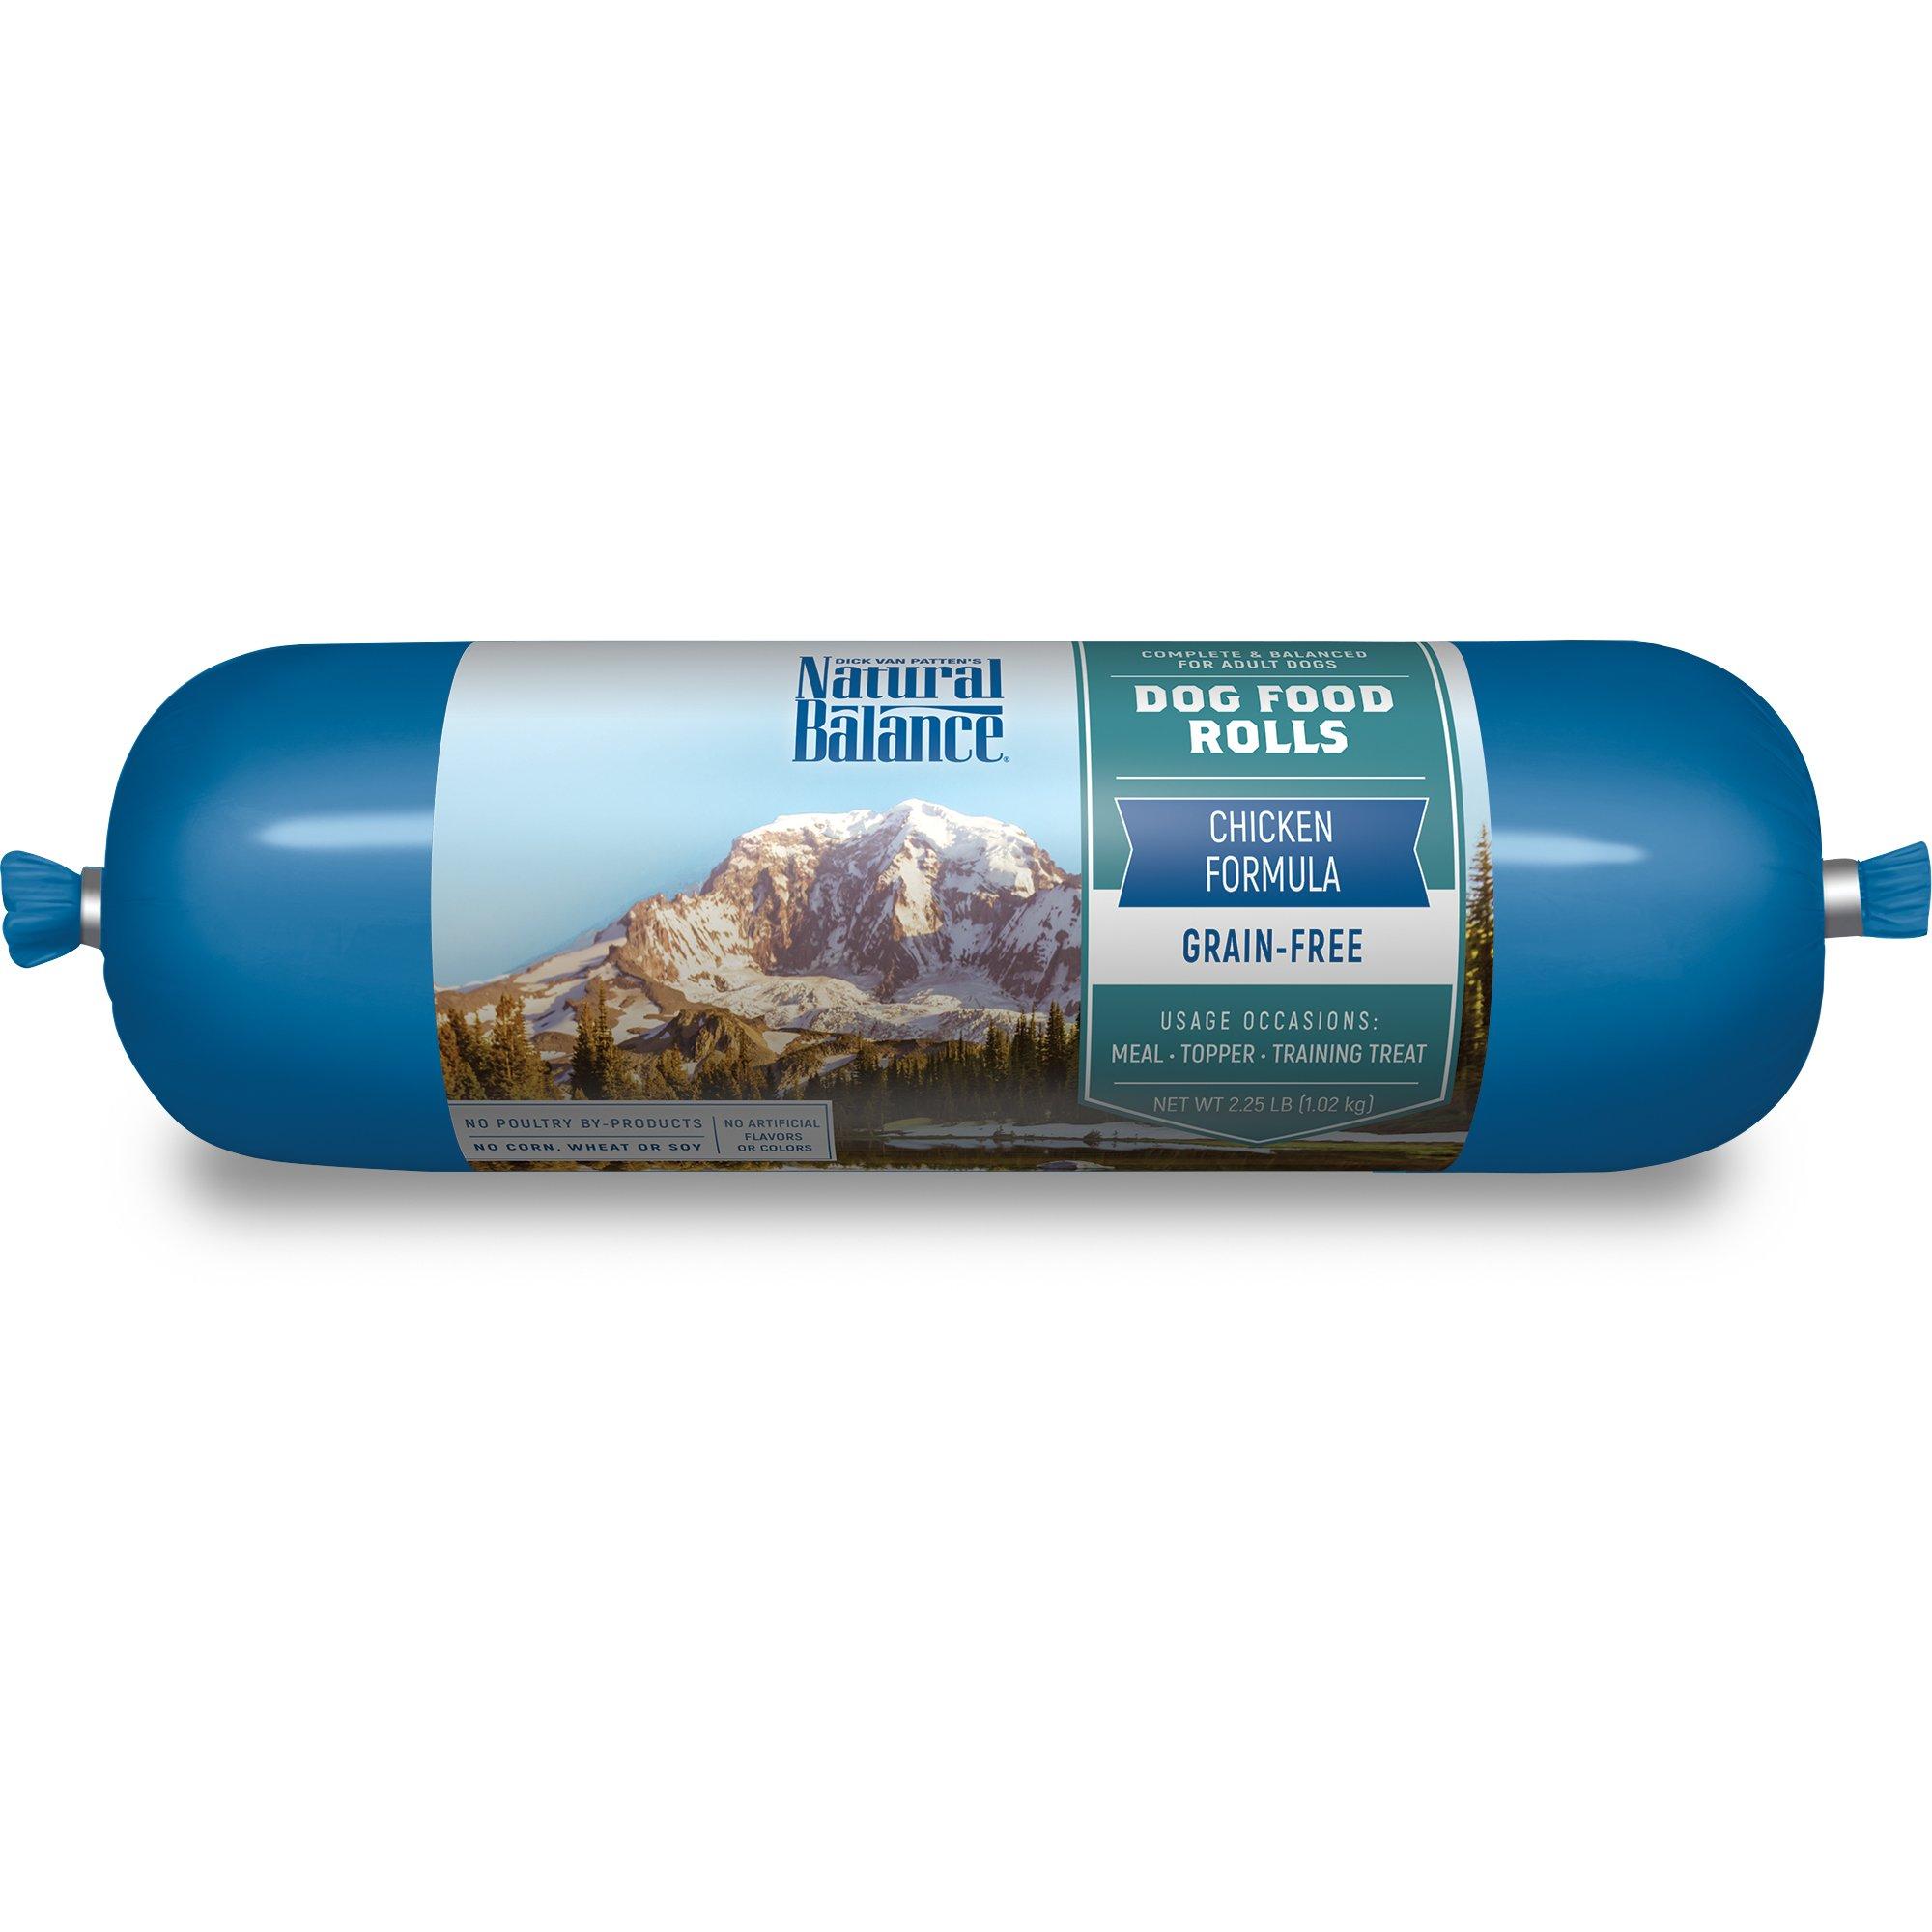 Amazon.com : Natural Balance Chicken Formula Dog Food Roll, 2.25 lb ...